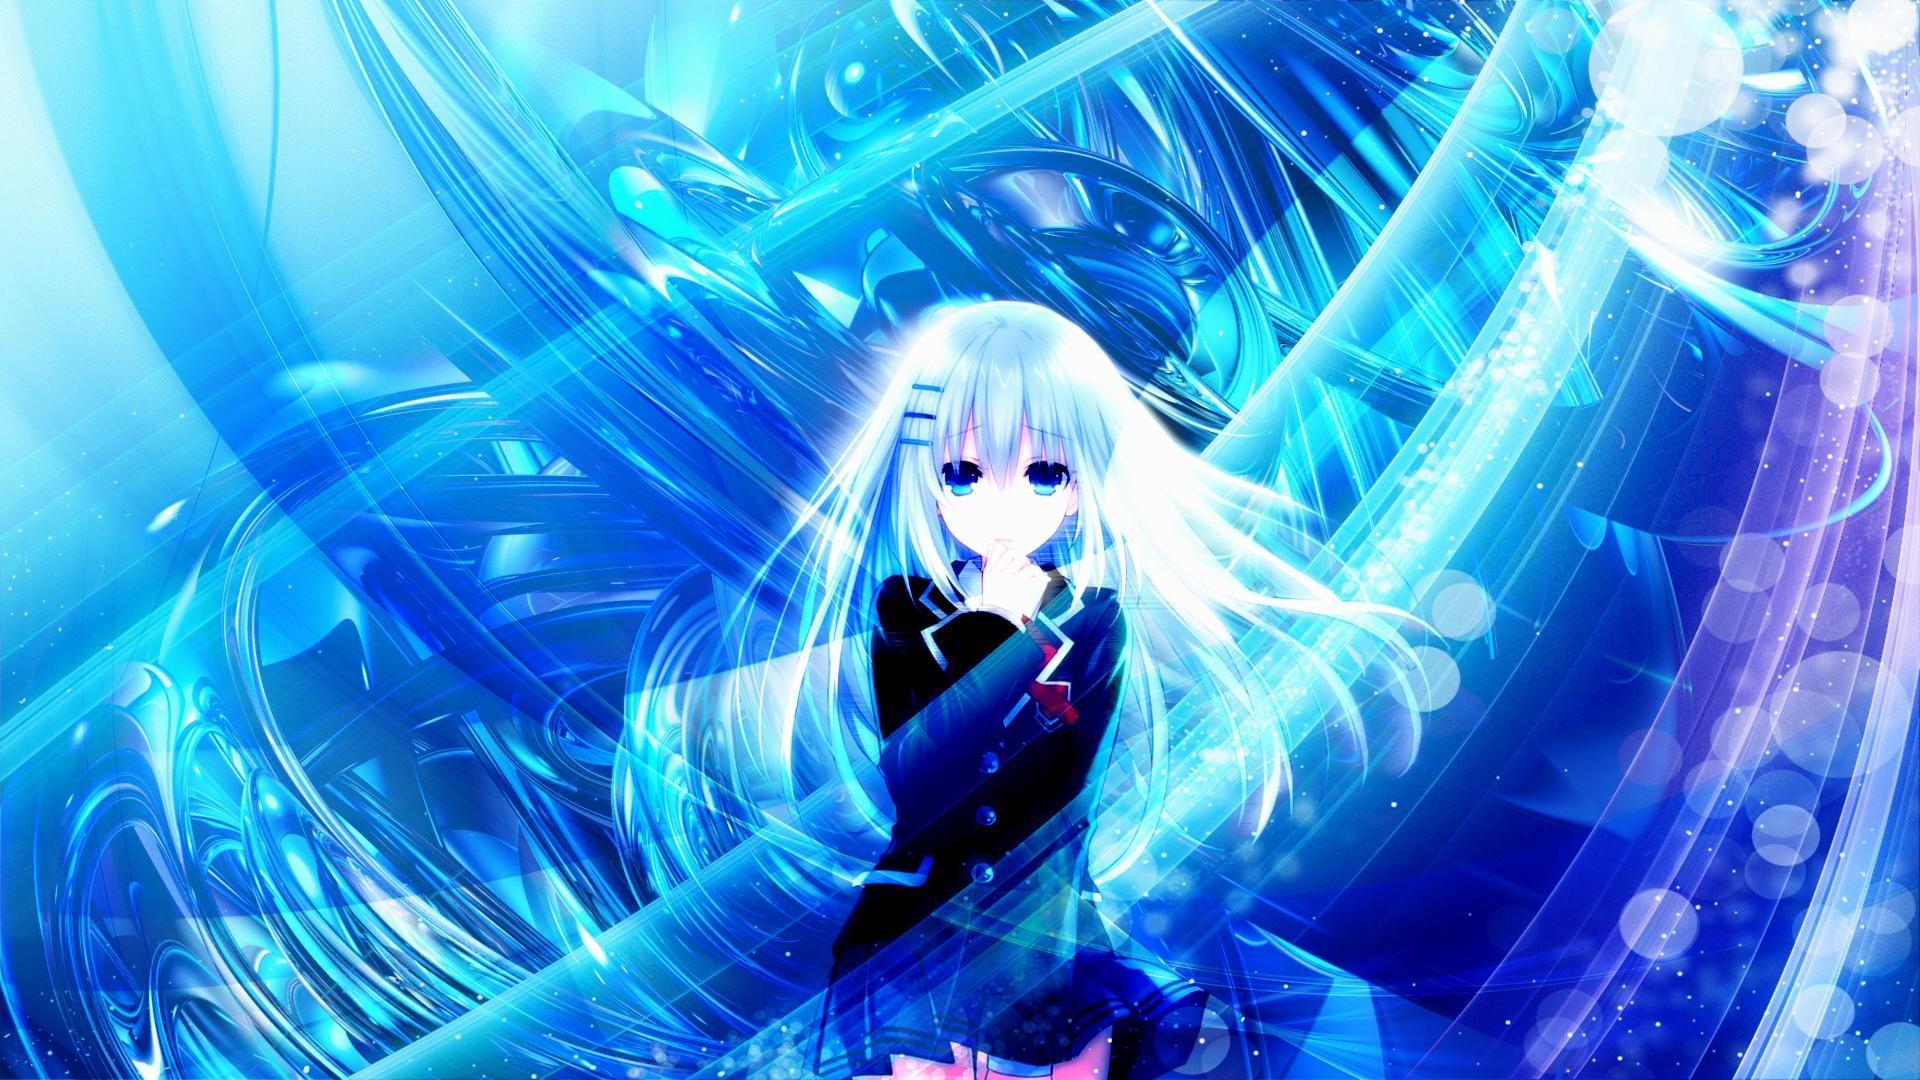 Anime Live Wallpapers For Desktop 62 Images